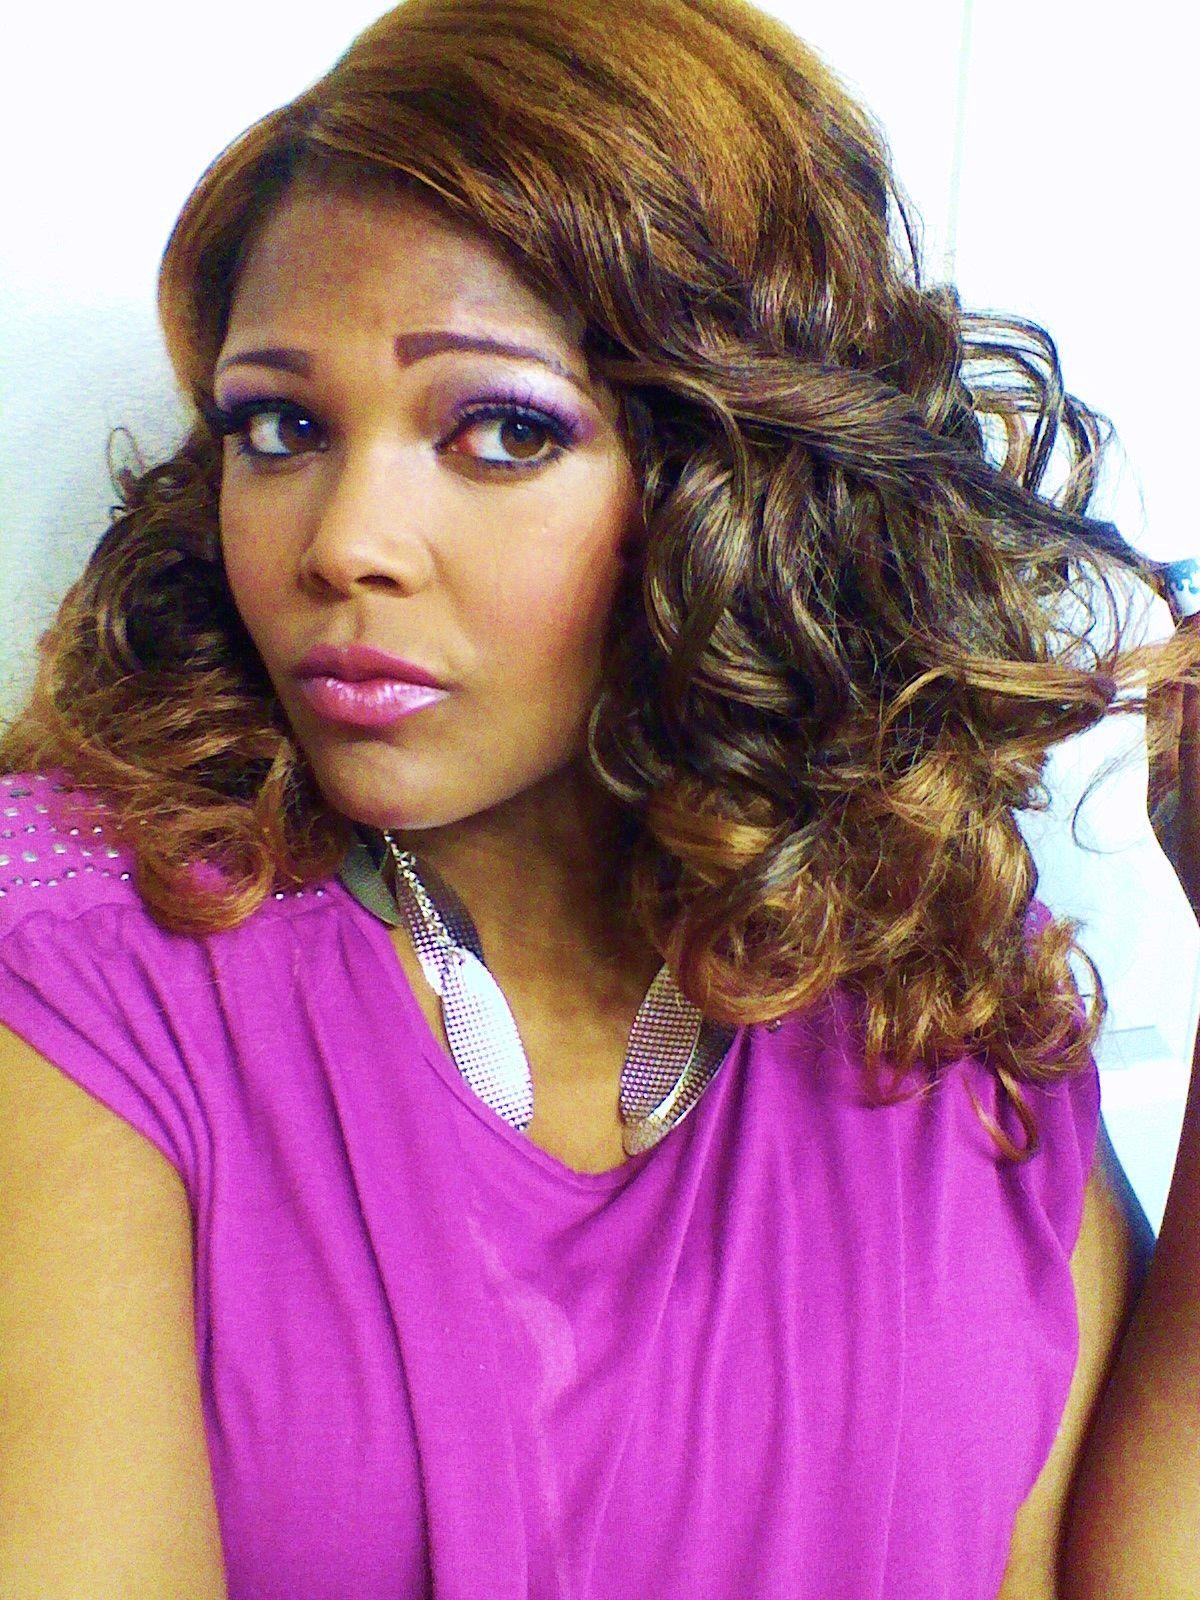 Kandi Burruss Hype Hair Magazine 2013 Look Using Clip In Hair